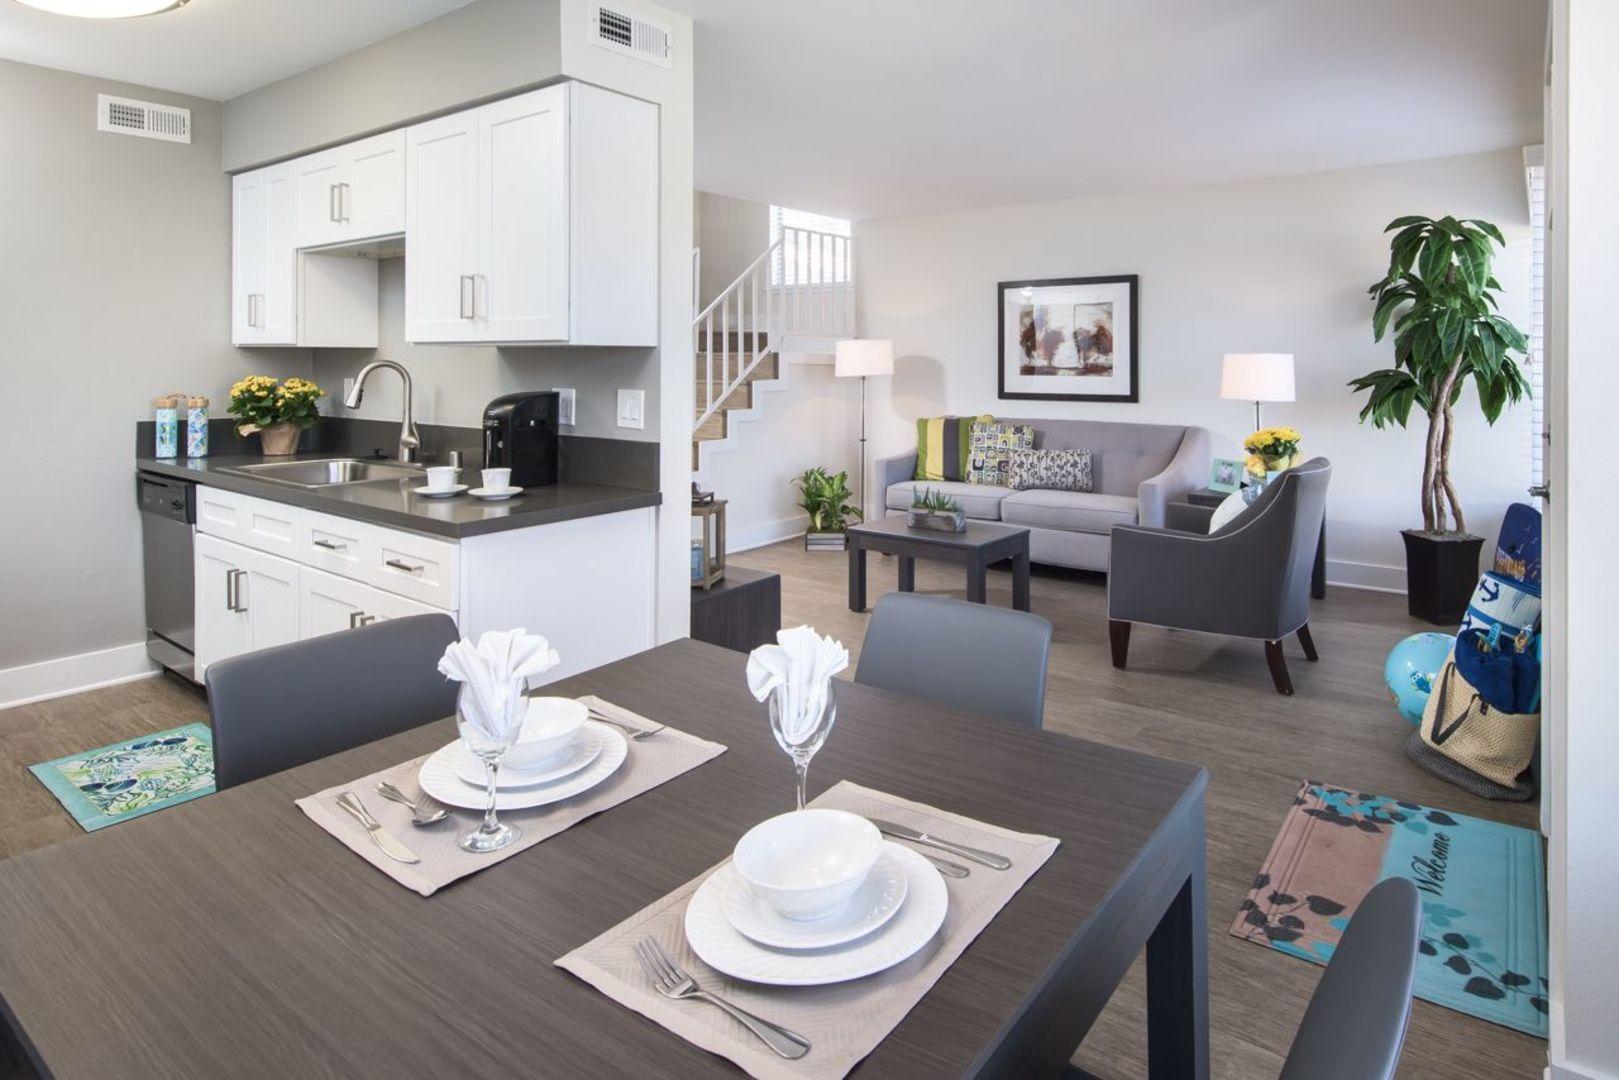 BEST WESTERN PALM GARDEN INN Updated Prices Best Western Palm Garden Inn  Short Term Rentals In Huntington Beach CA Apartments Com Best Apartments In  ...